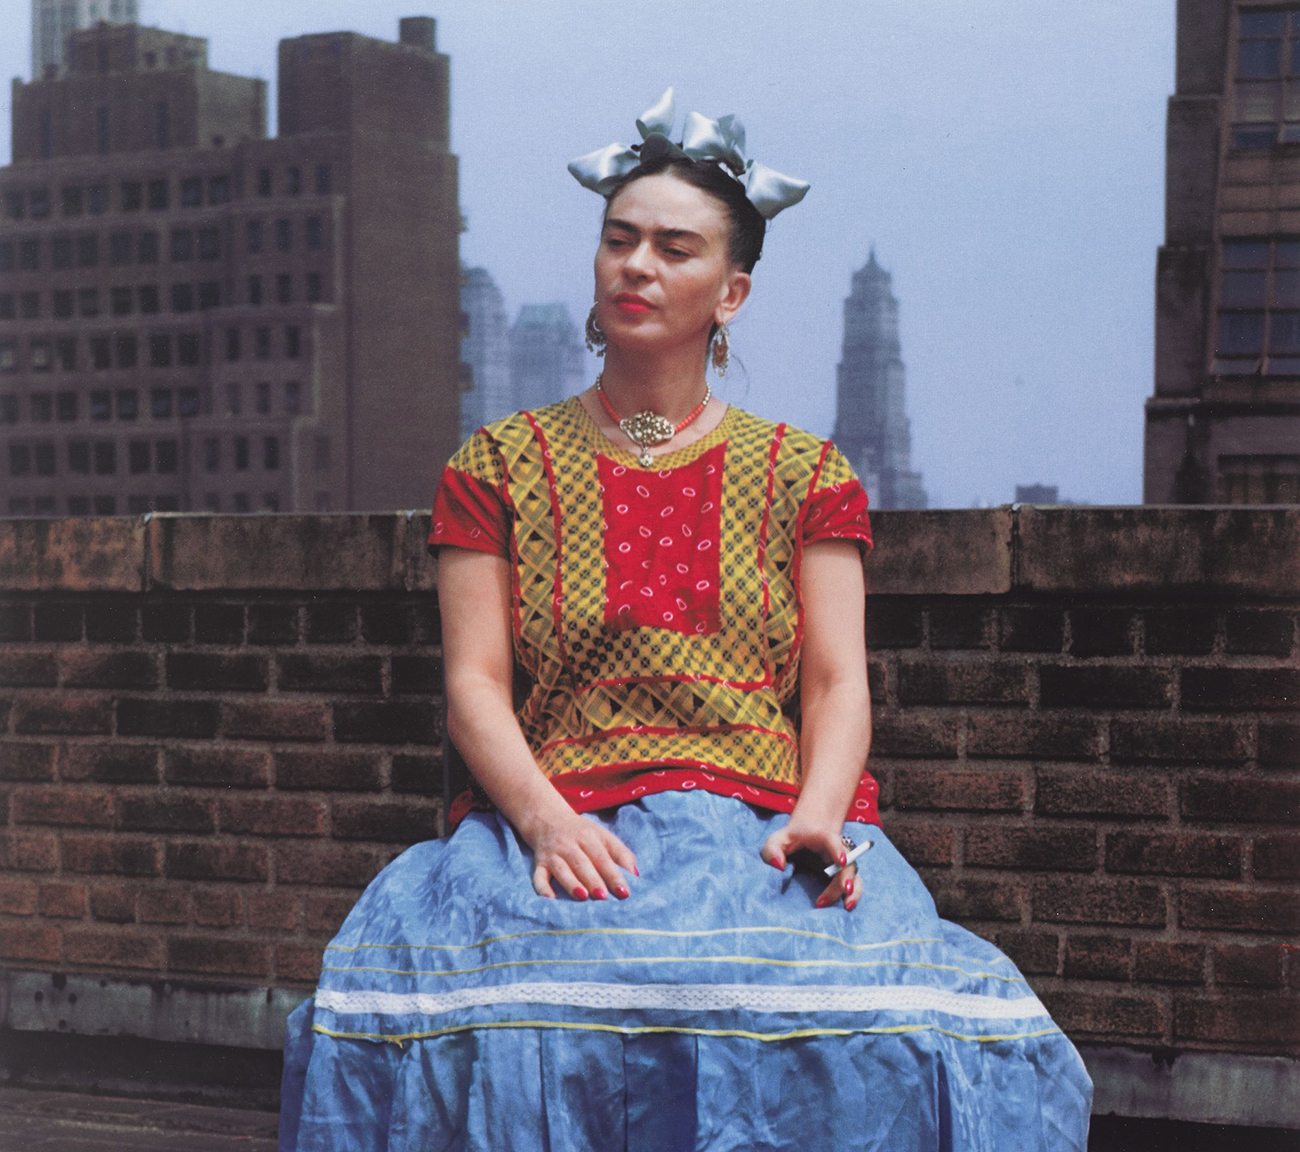 new york city culture news February 16